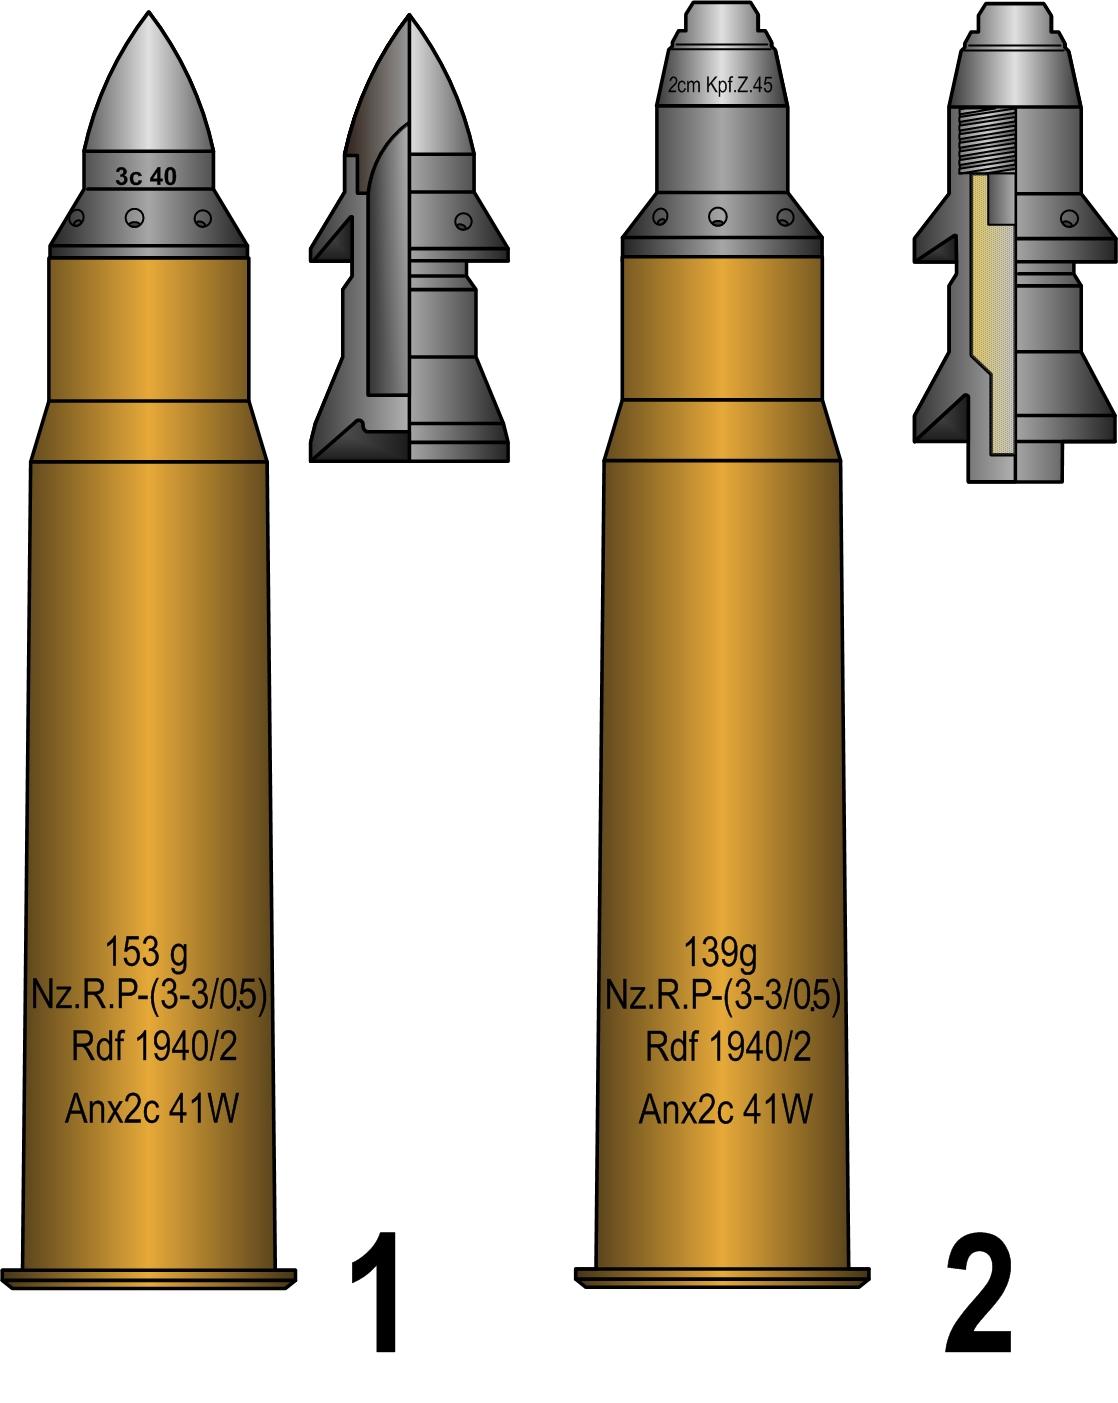 2.8 cm shells